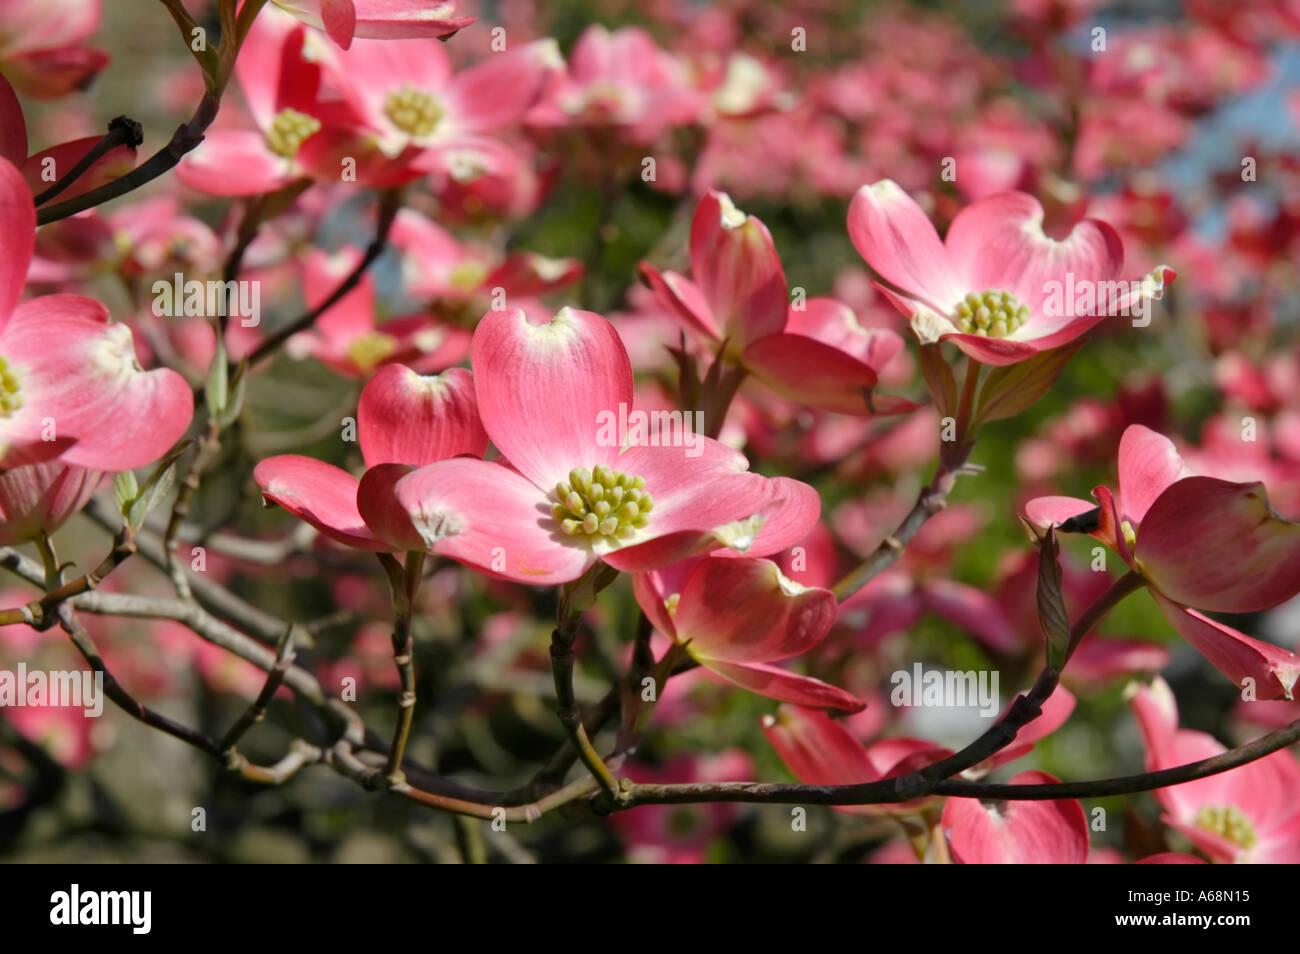 Pink Dogwood Blossoms Stock Photo 3753236 Alamy